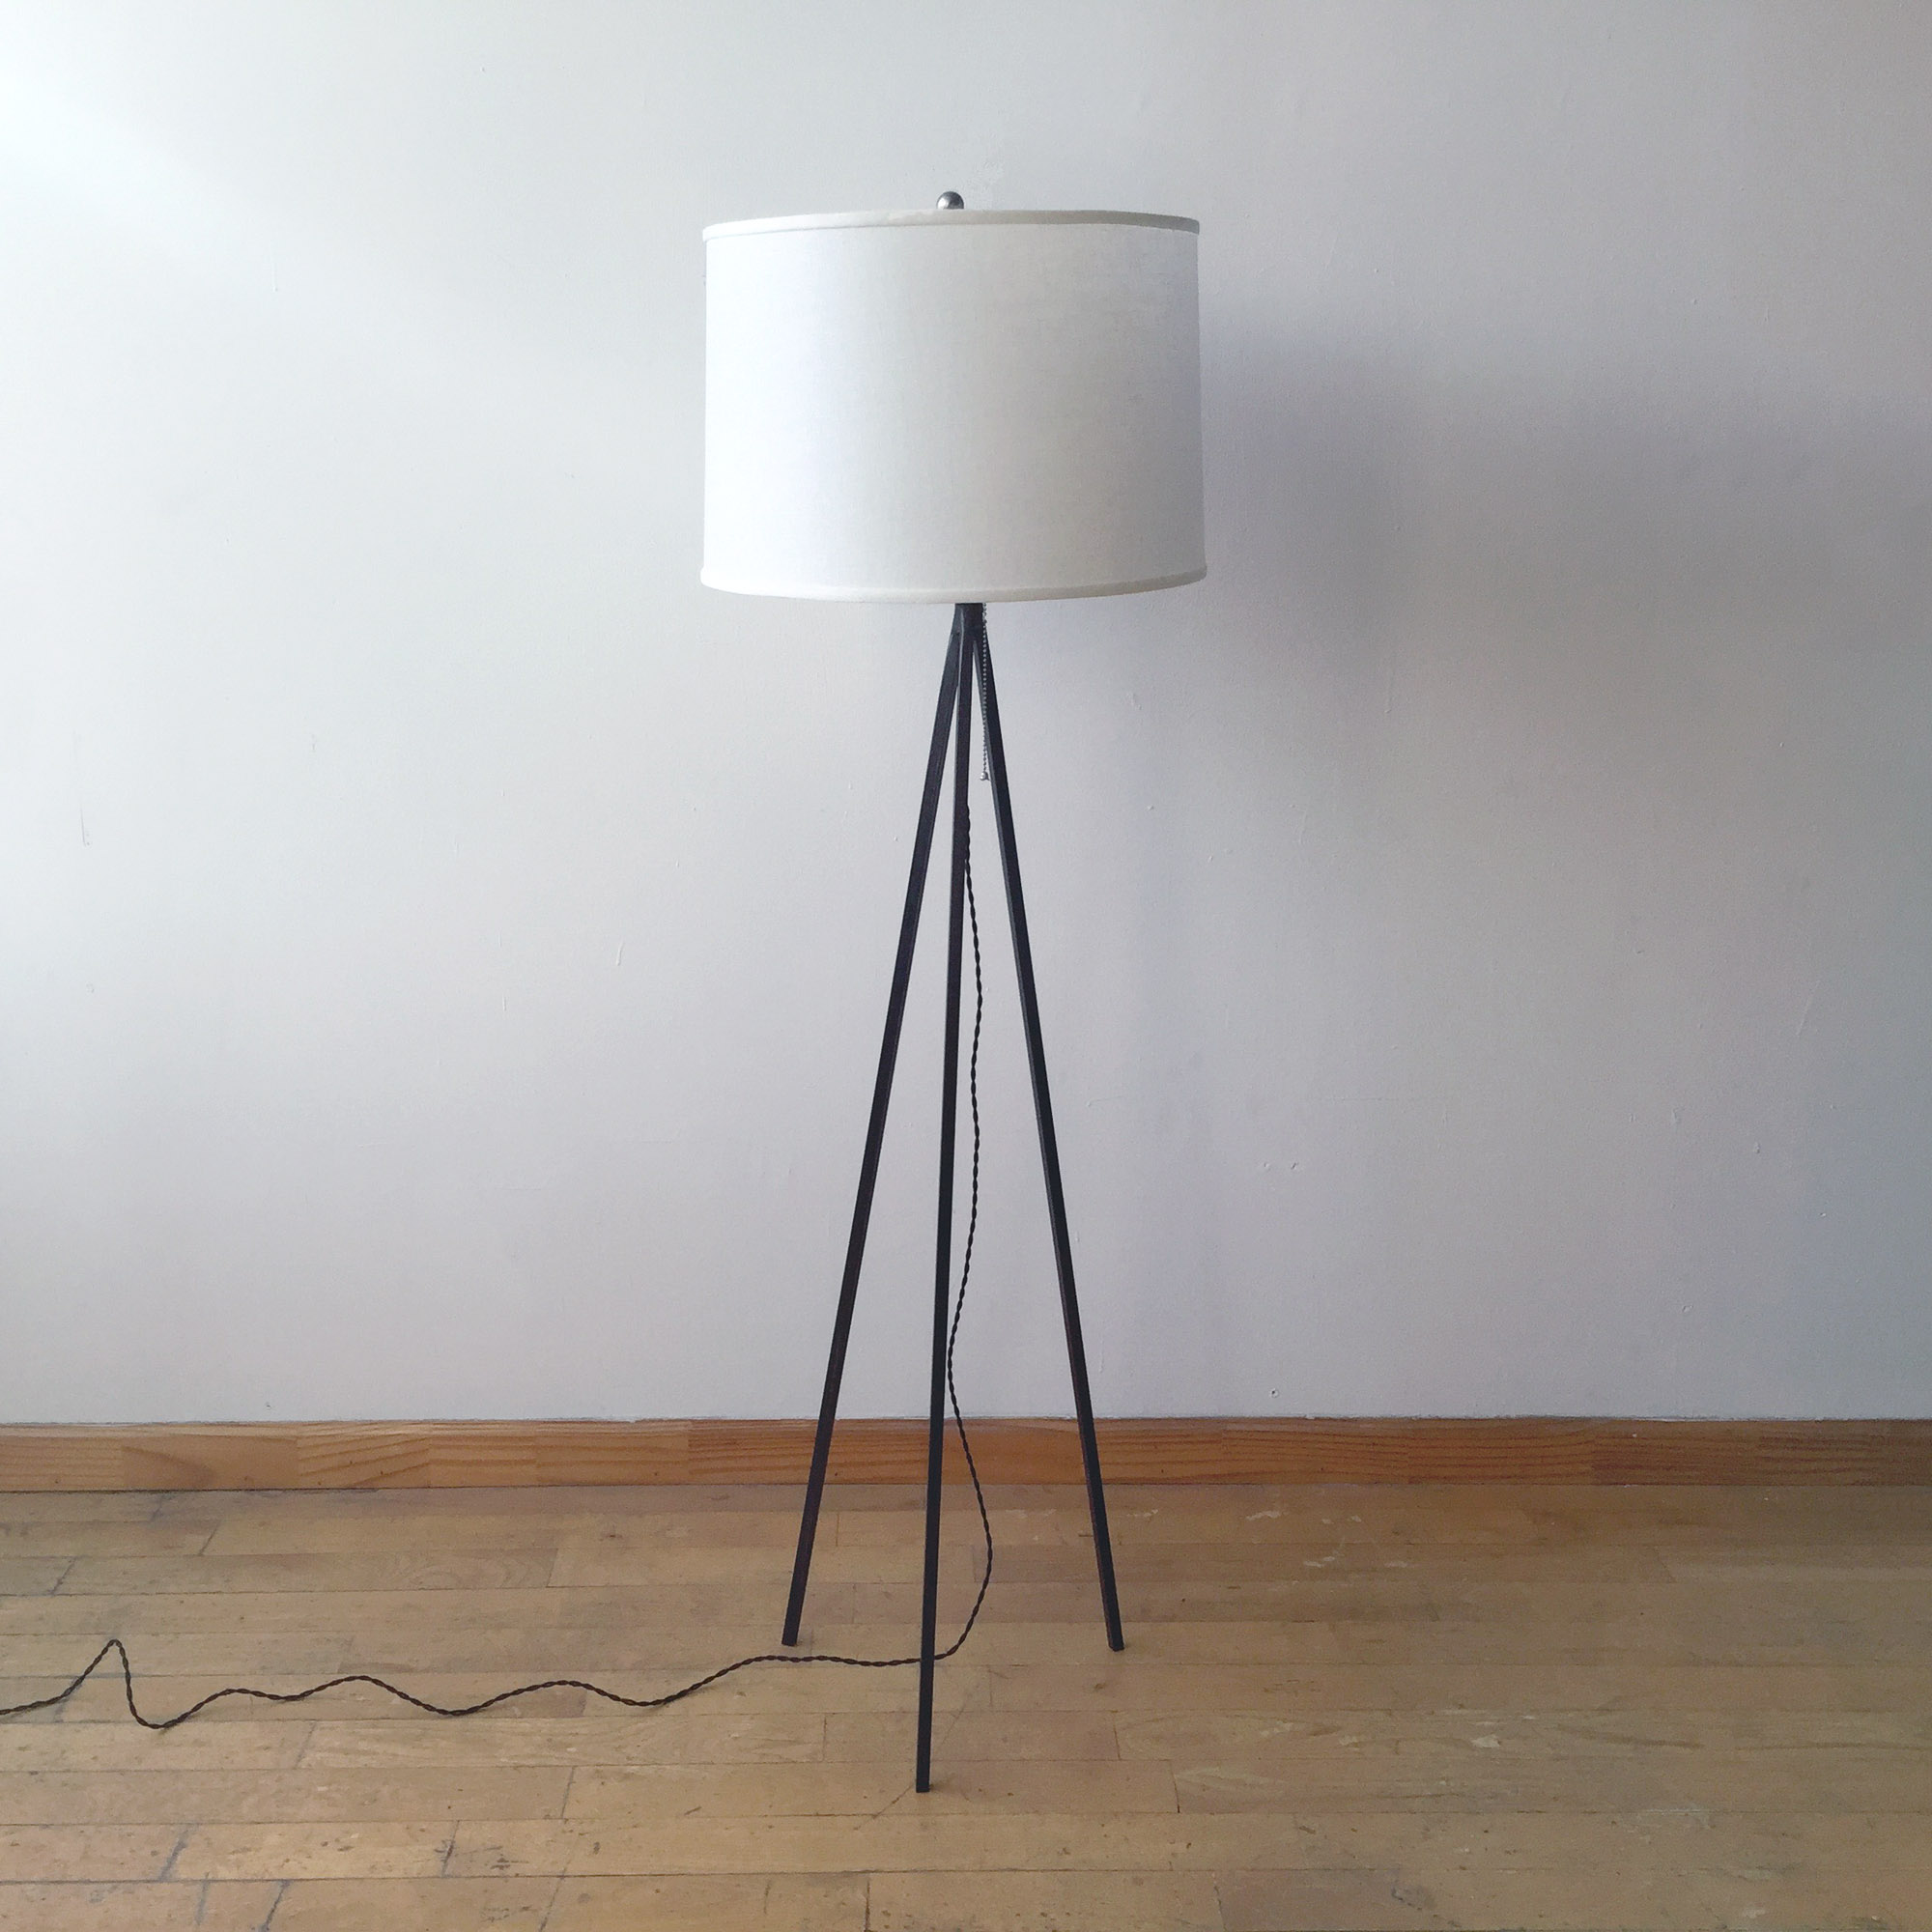 Standing Lamp #2